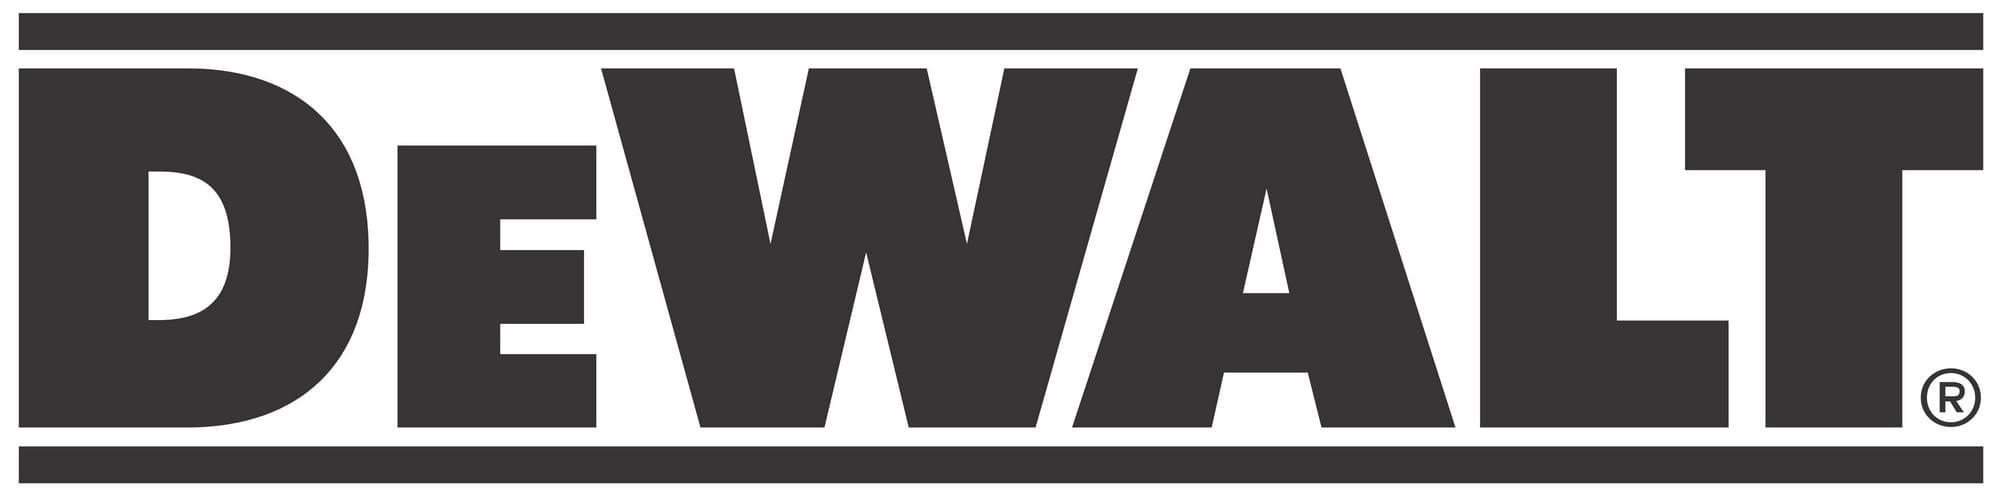 DeWalt Logo [PDF] png